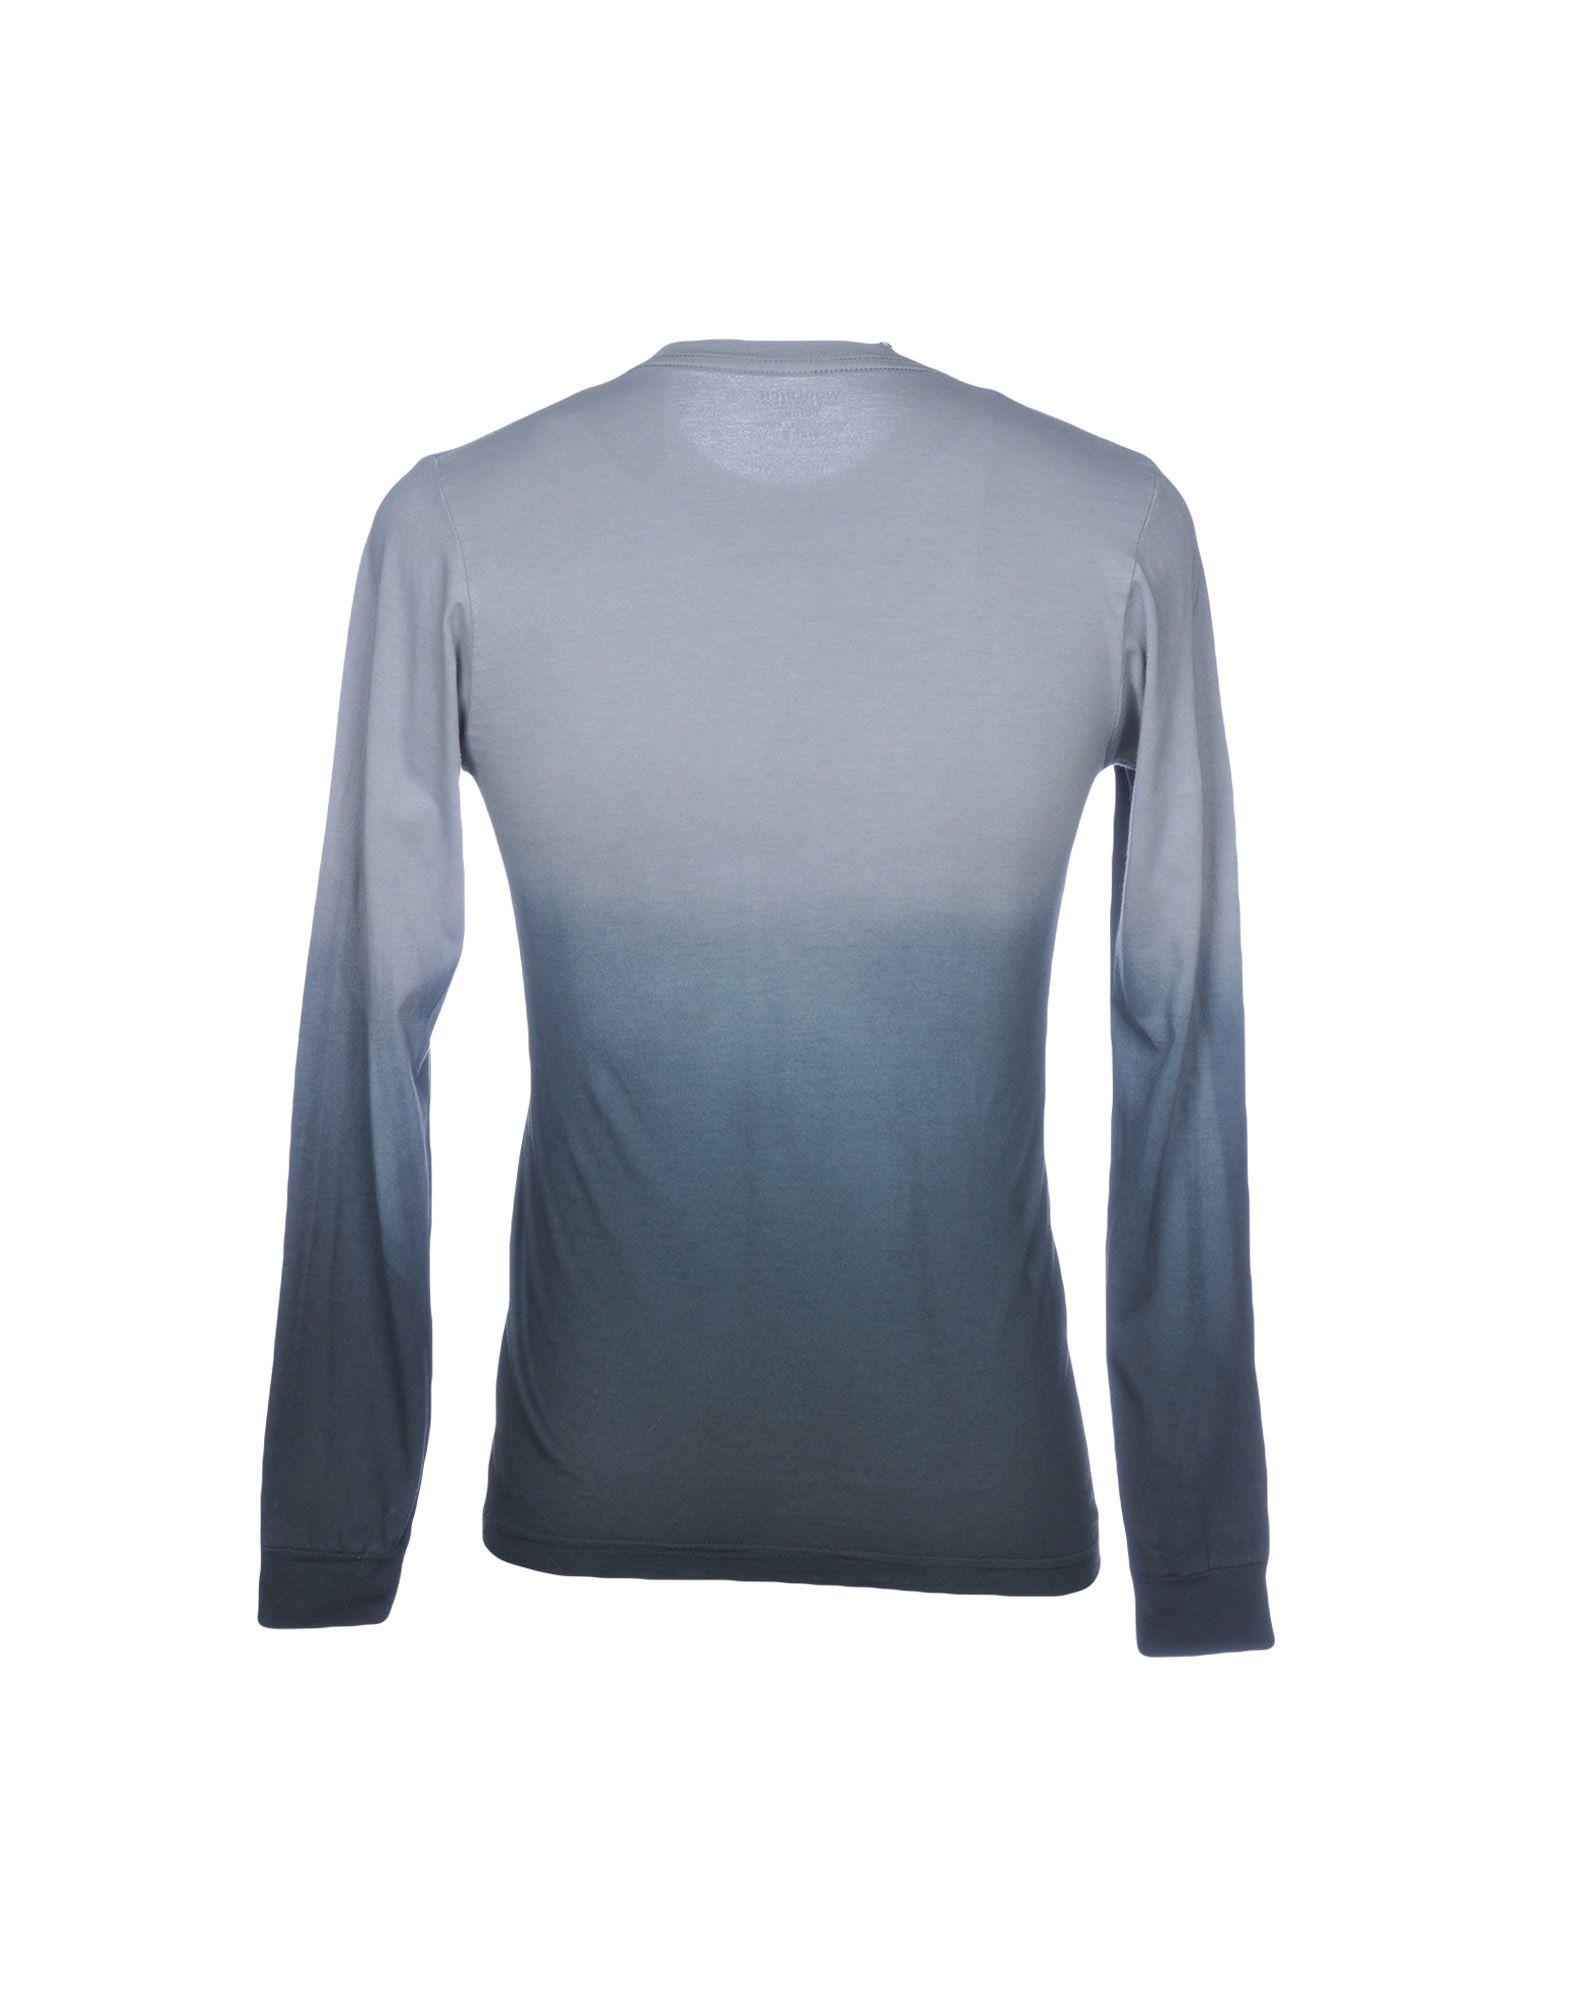 A buon Woolrich mercato A buon mercato T-Shirt Woolrich buon Uomo - 12181097TM c40c79